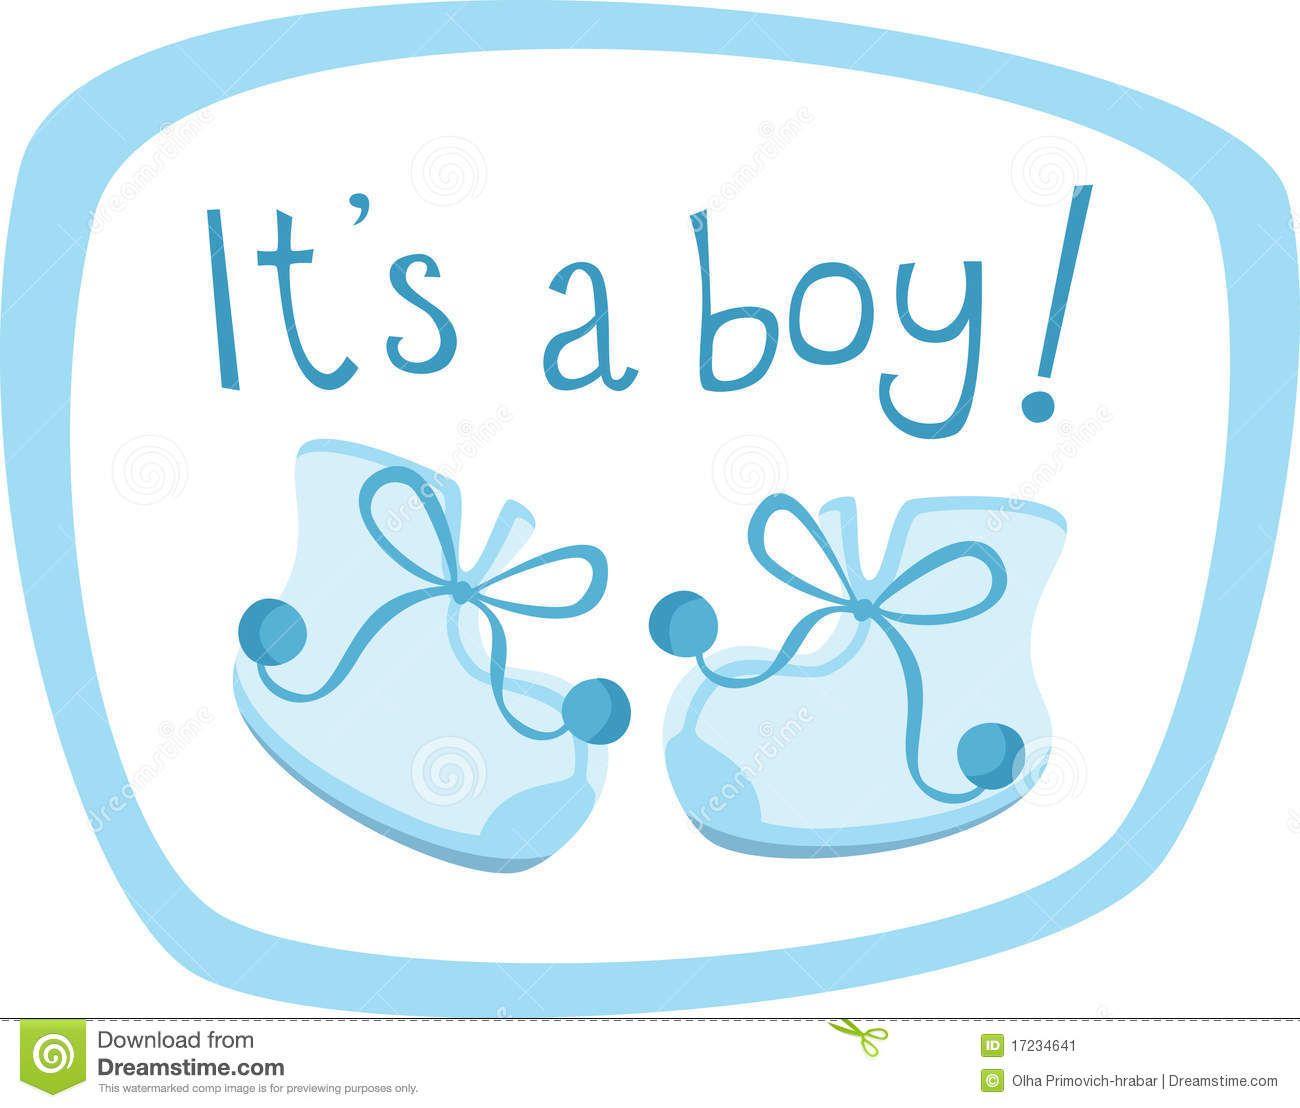 Pics for girl booties. Cap clipart baby boy